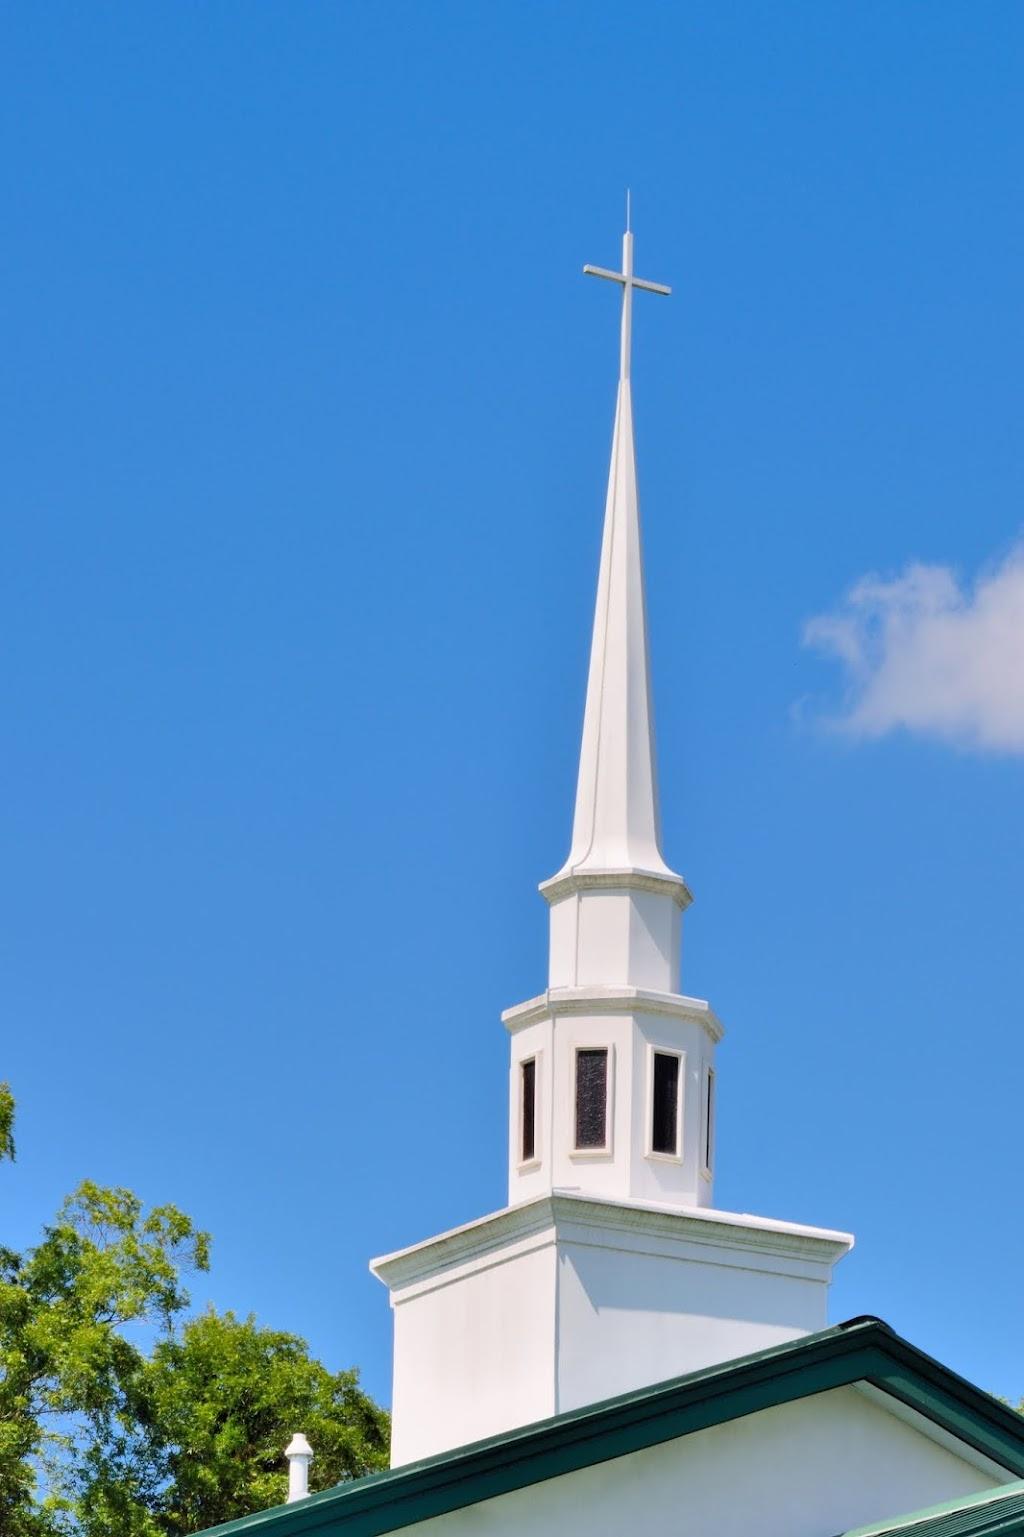 Mount Carmel Missionary Baptist Church - church    Photo 4 of 8   Address: 836 US-158, Elizabeth City, NC 27909, USA   Phone: (252) 771-5001